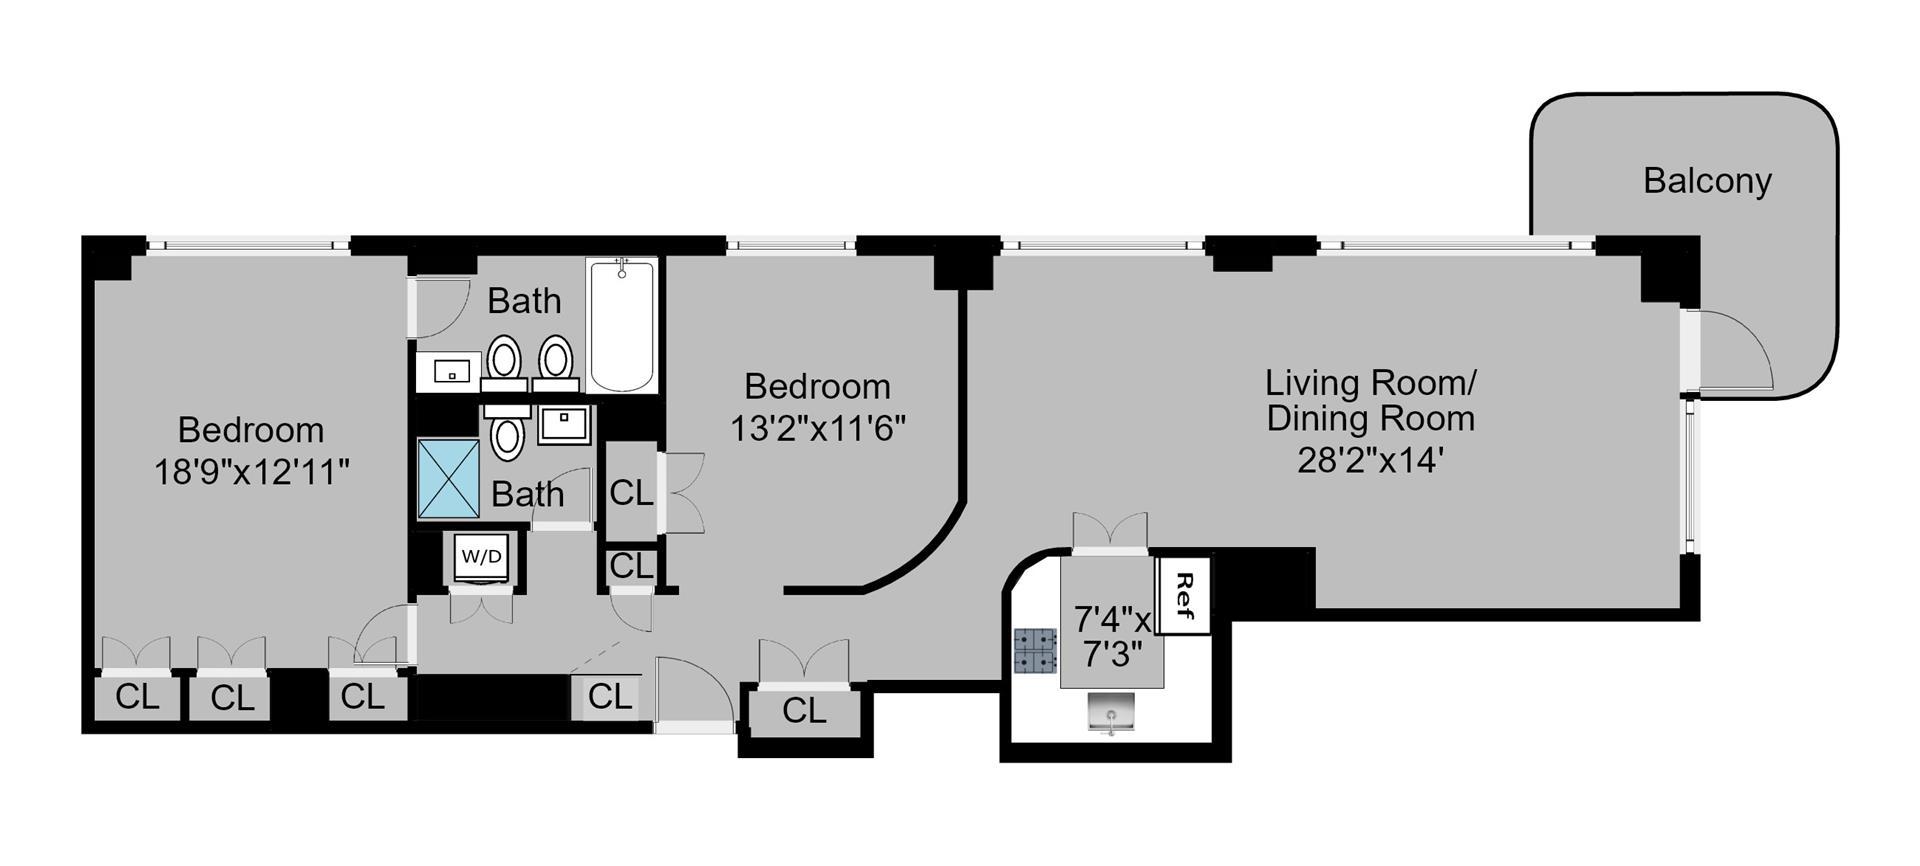 Floor plan of 309 East 49th St, 14D - Turtle Bay, New York